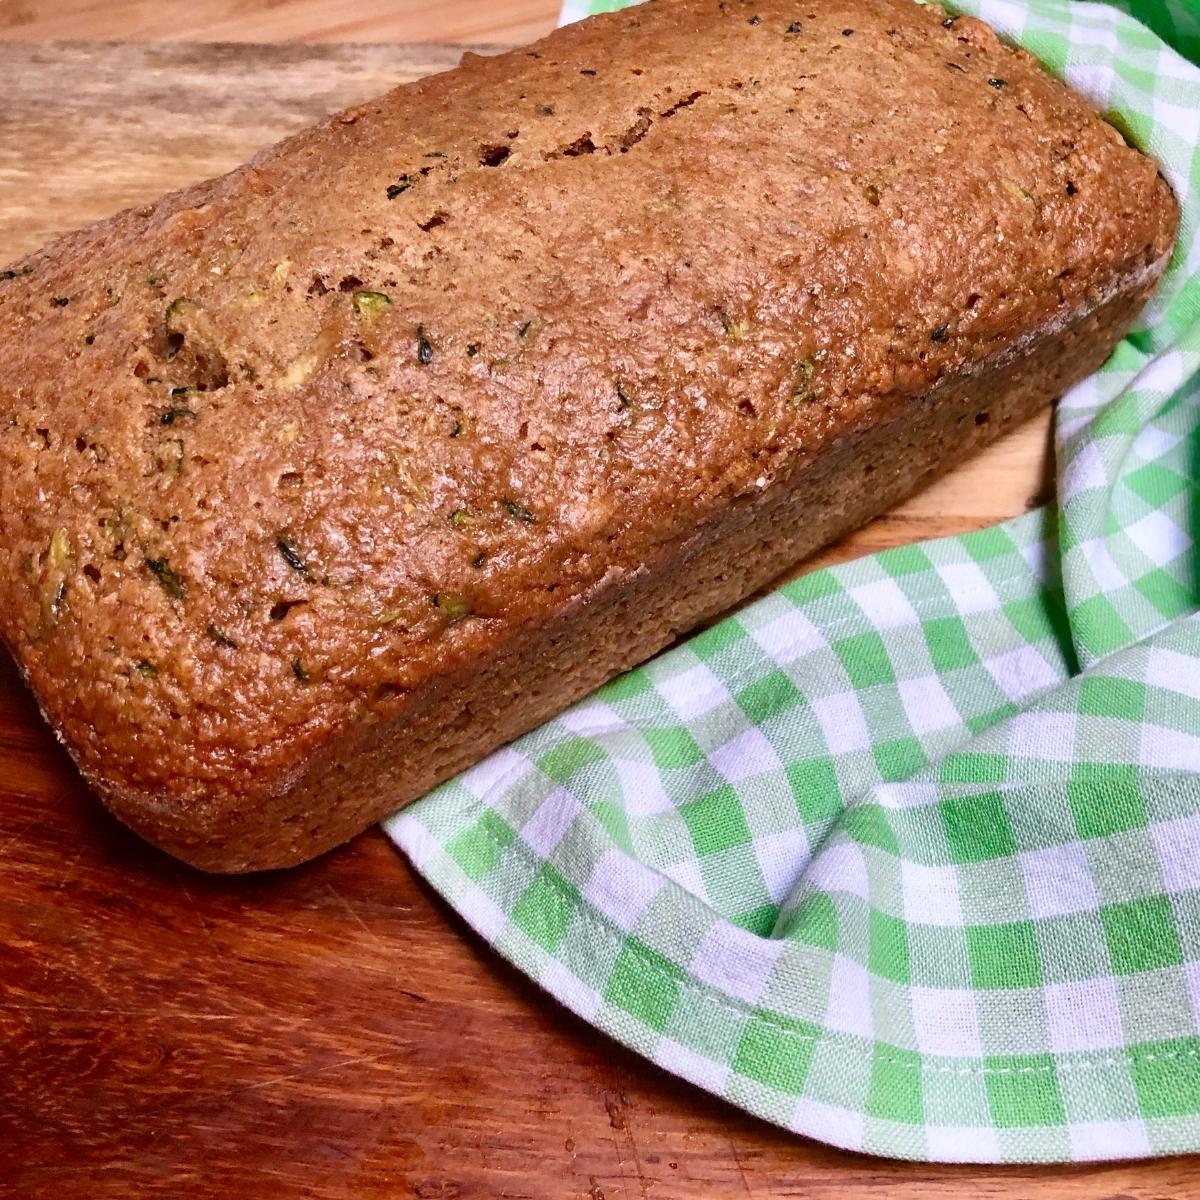 Loaf of freshly baked vegan zucchini bread.